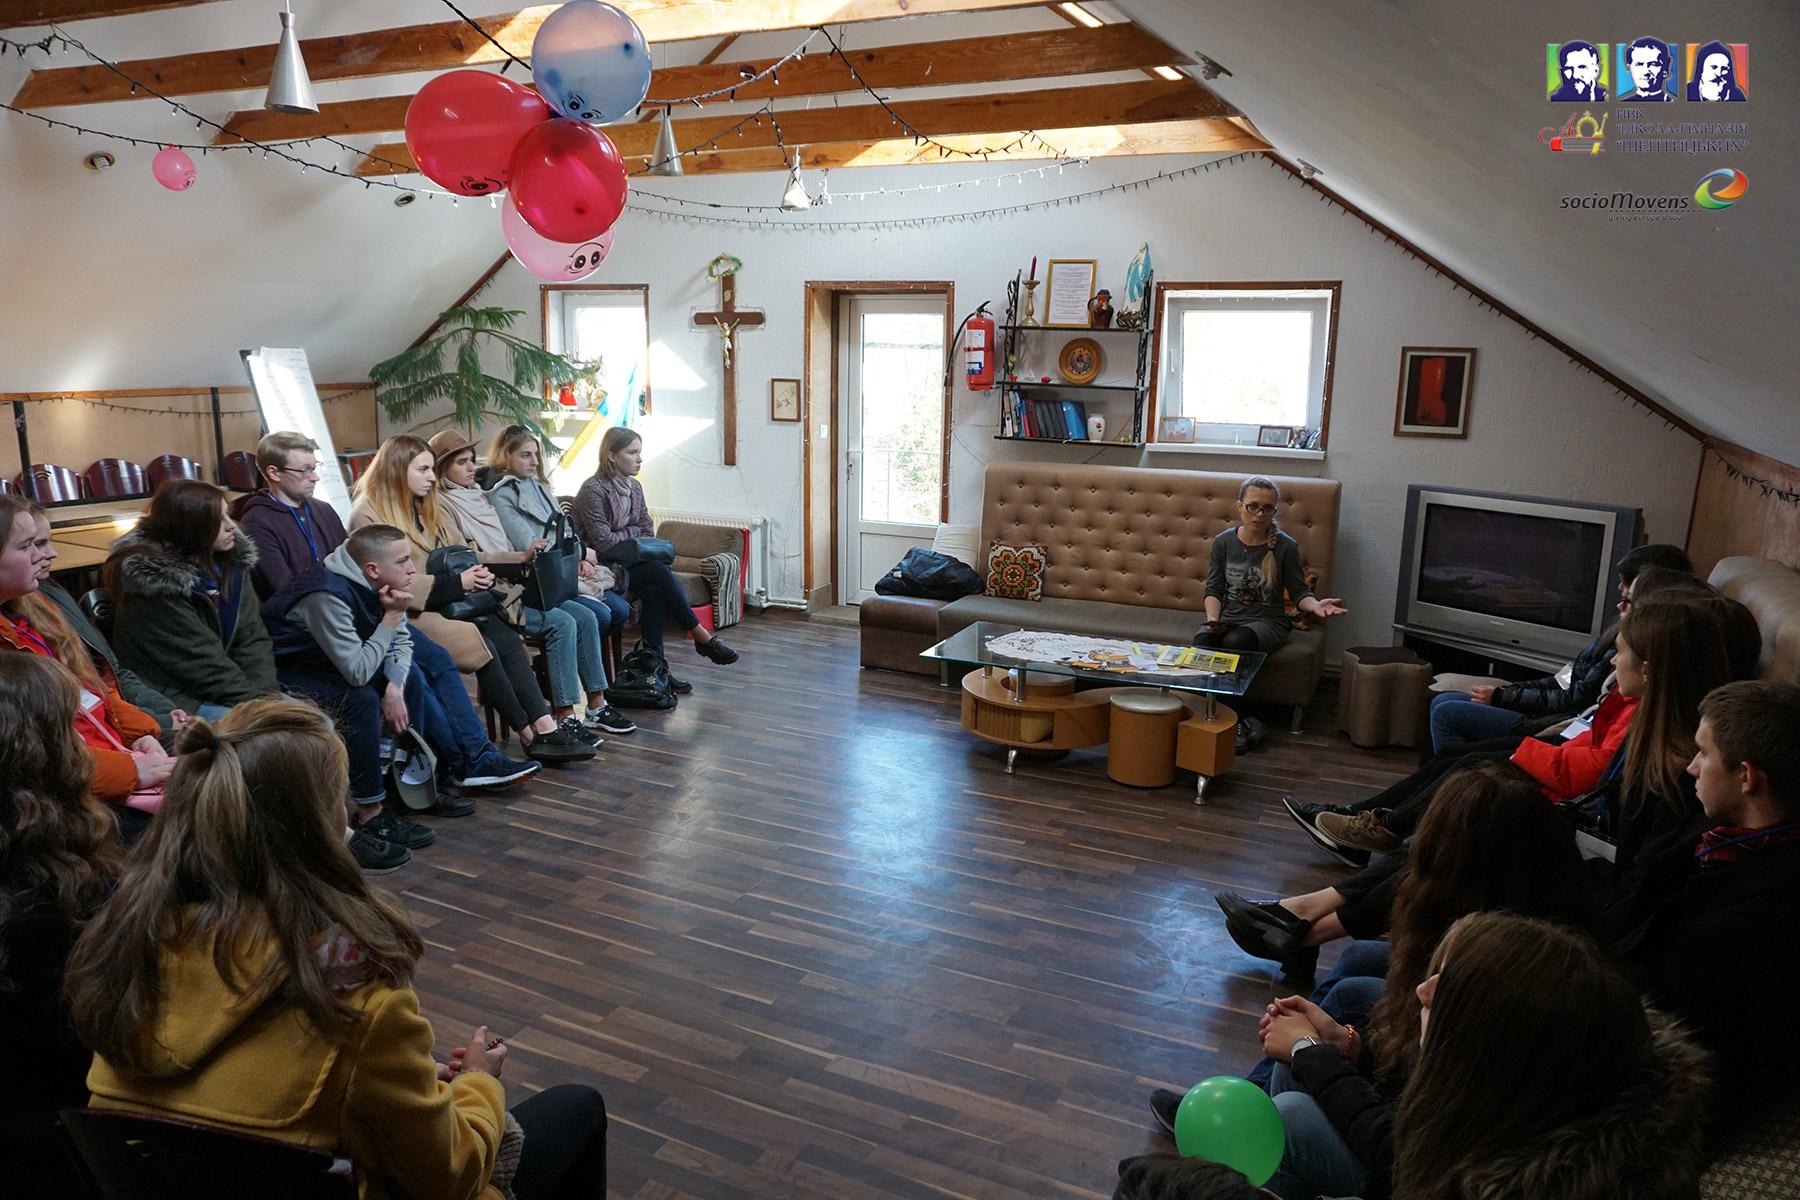 Project Week Lviv 2018 | socioMovens